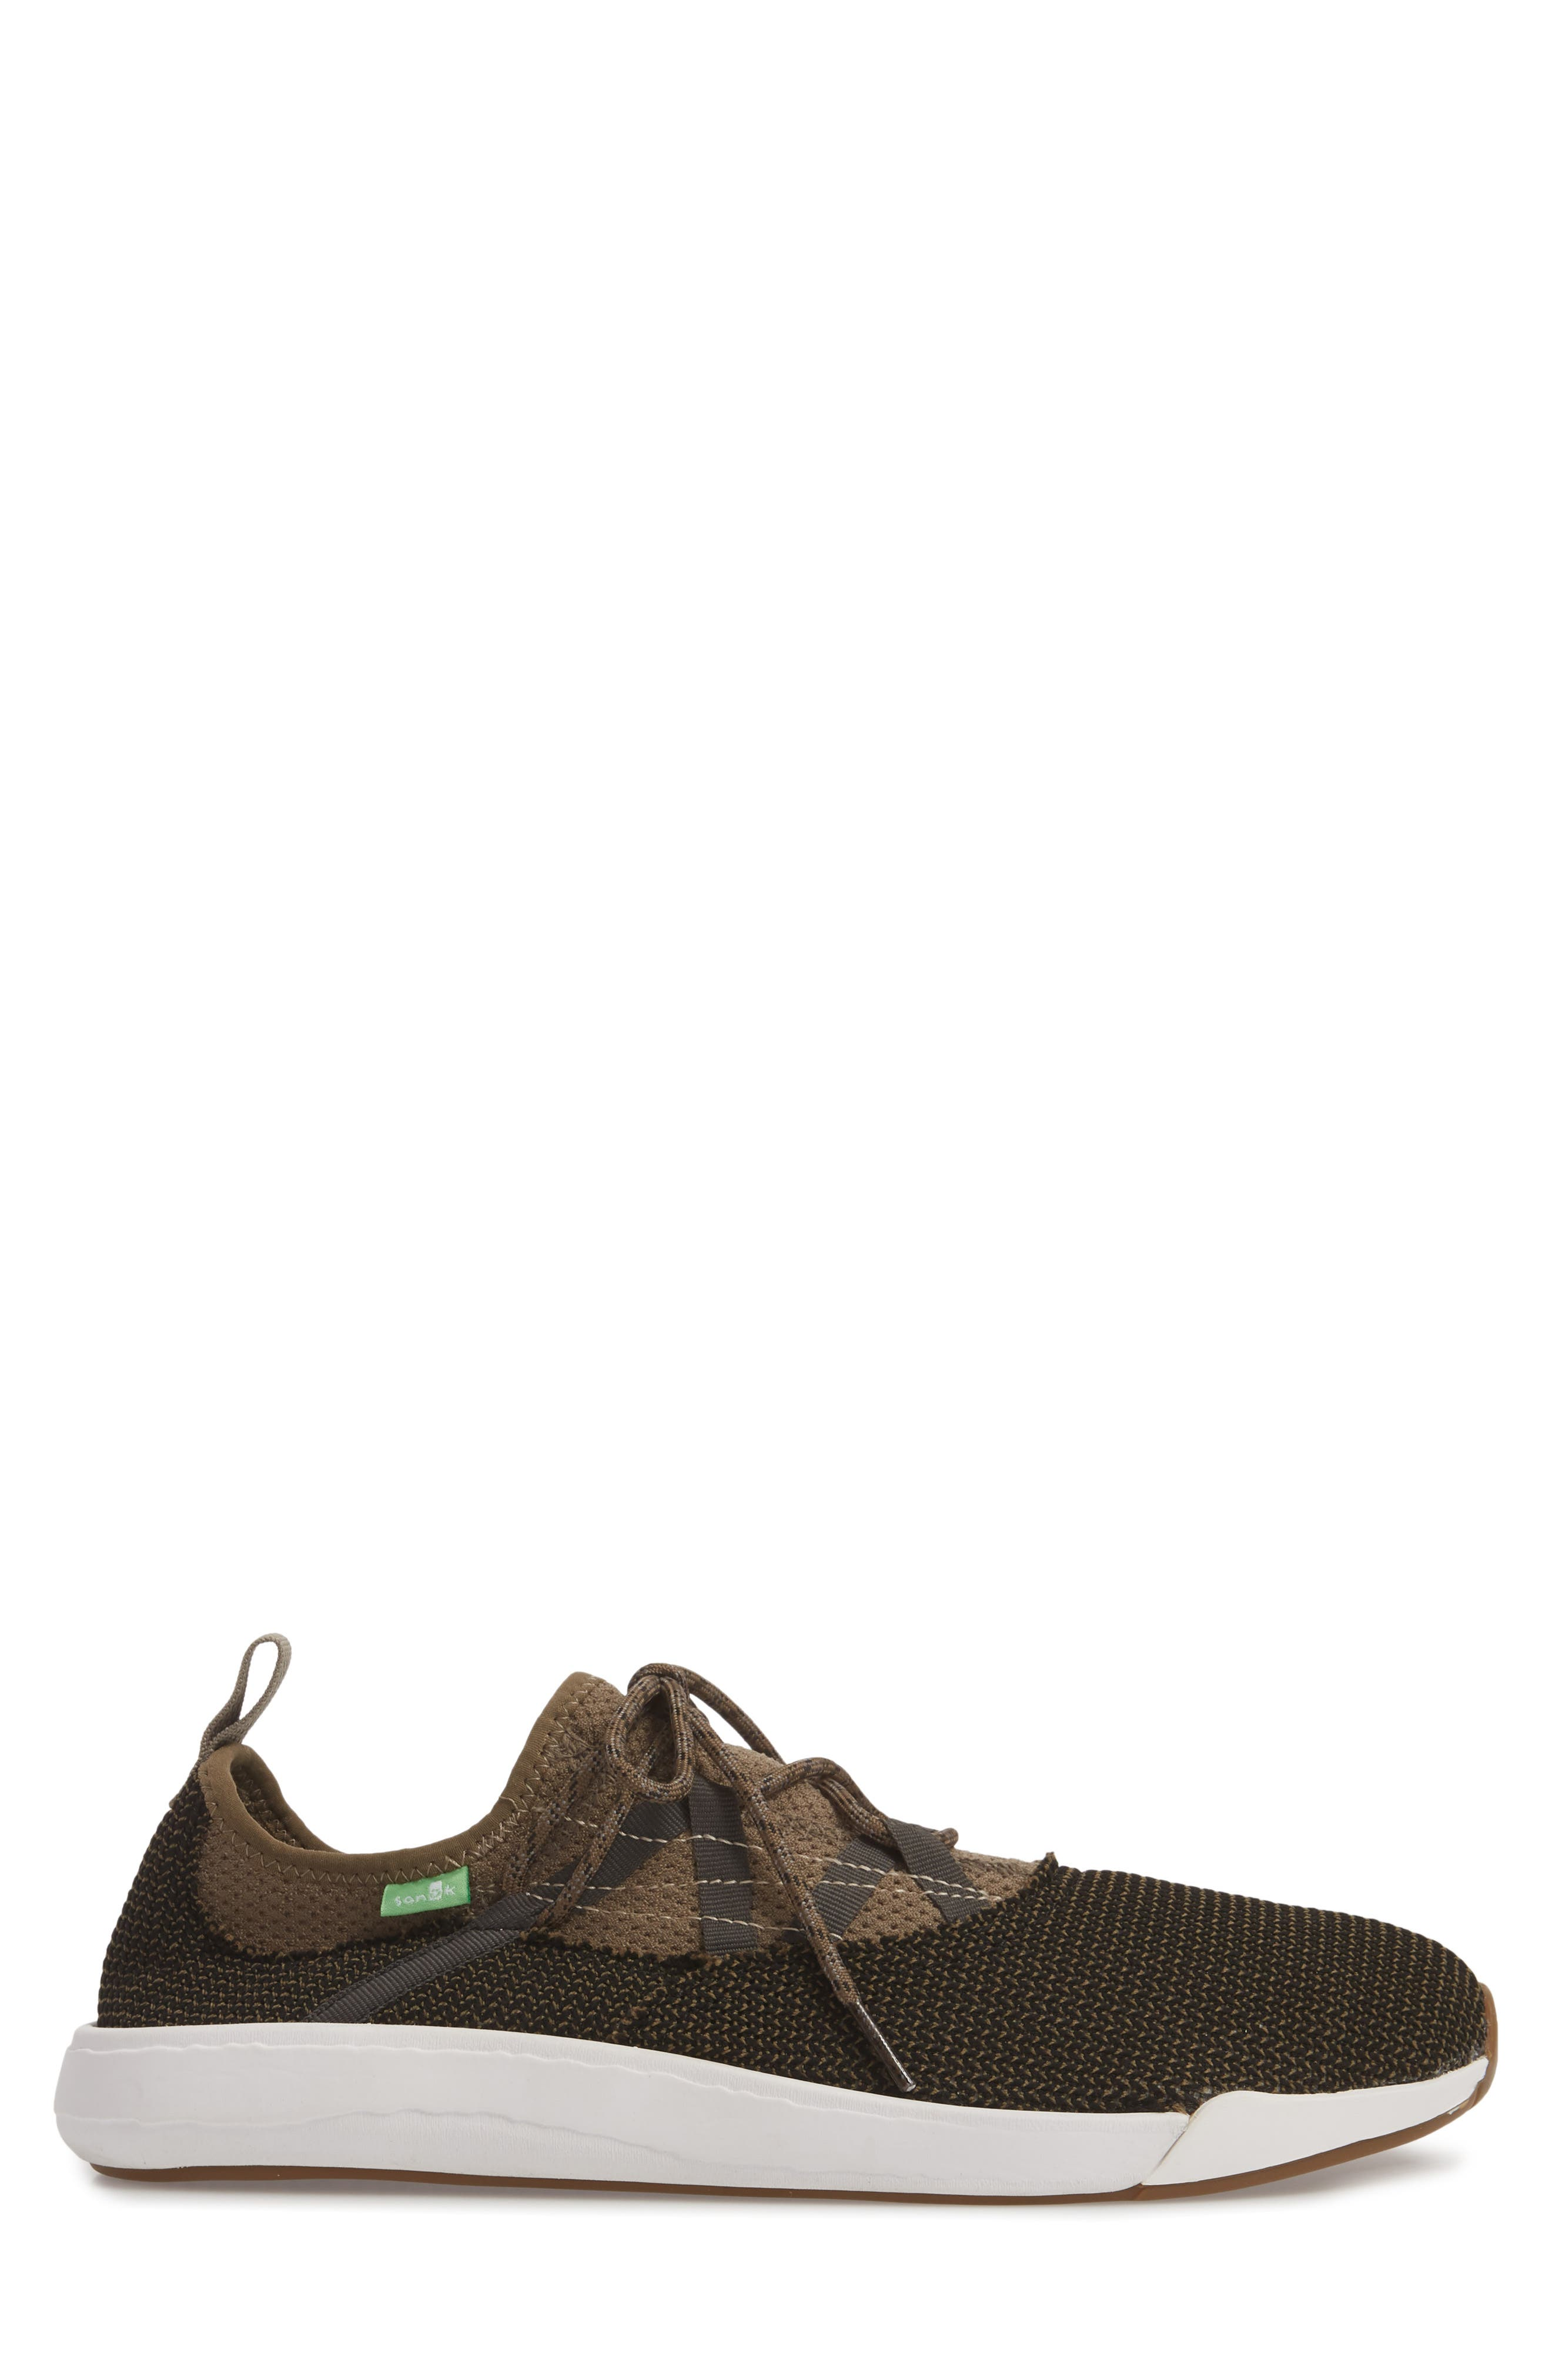 Chiba Quest Knit Sneaker,                             Alternate thumbnail 3, color,                             206